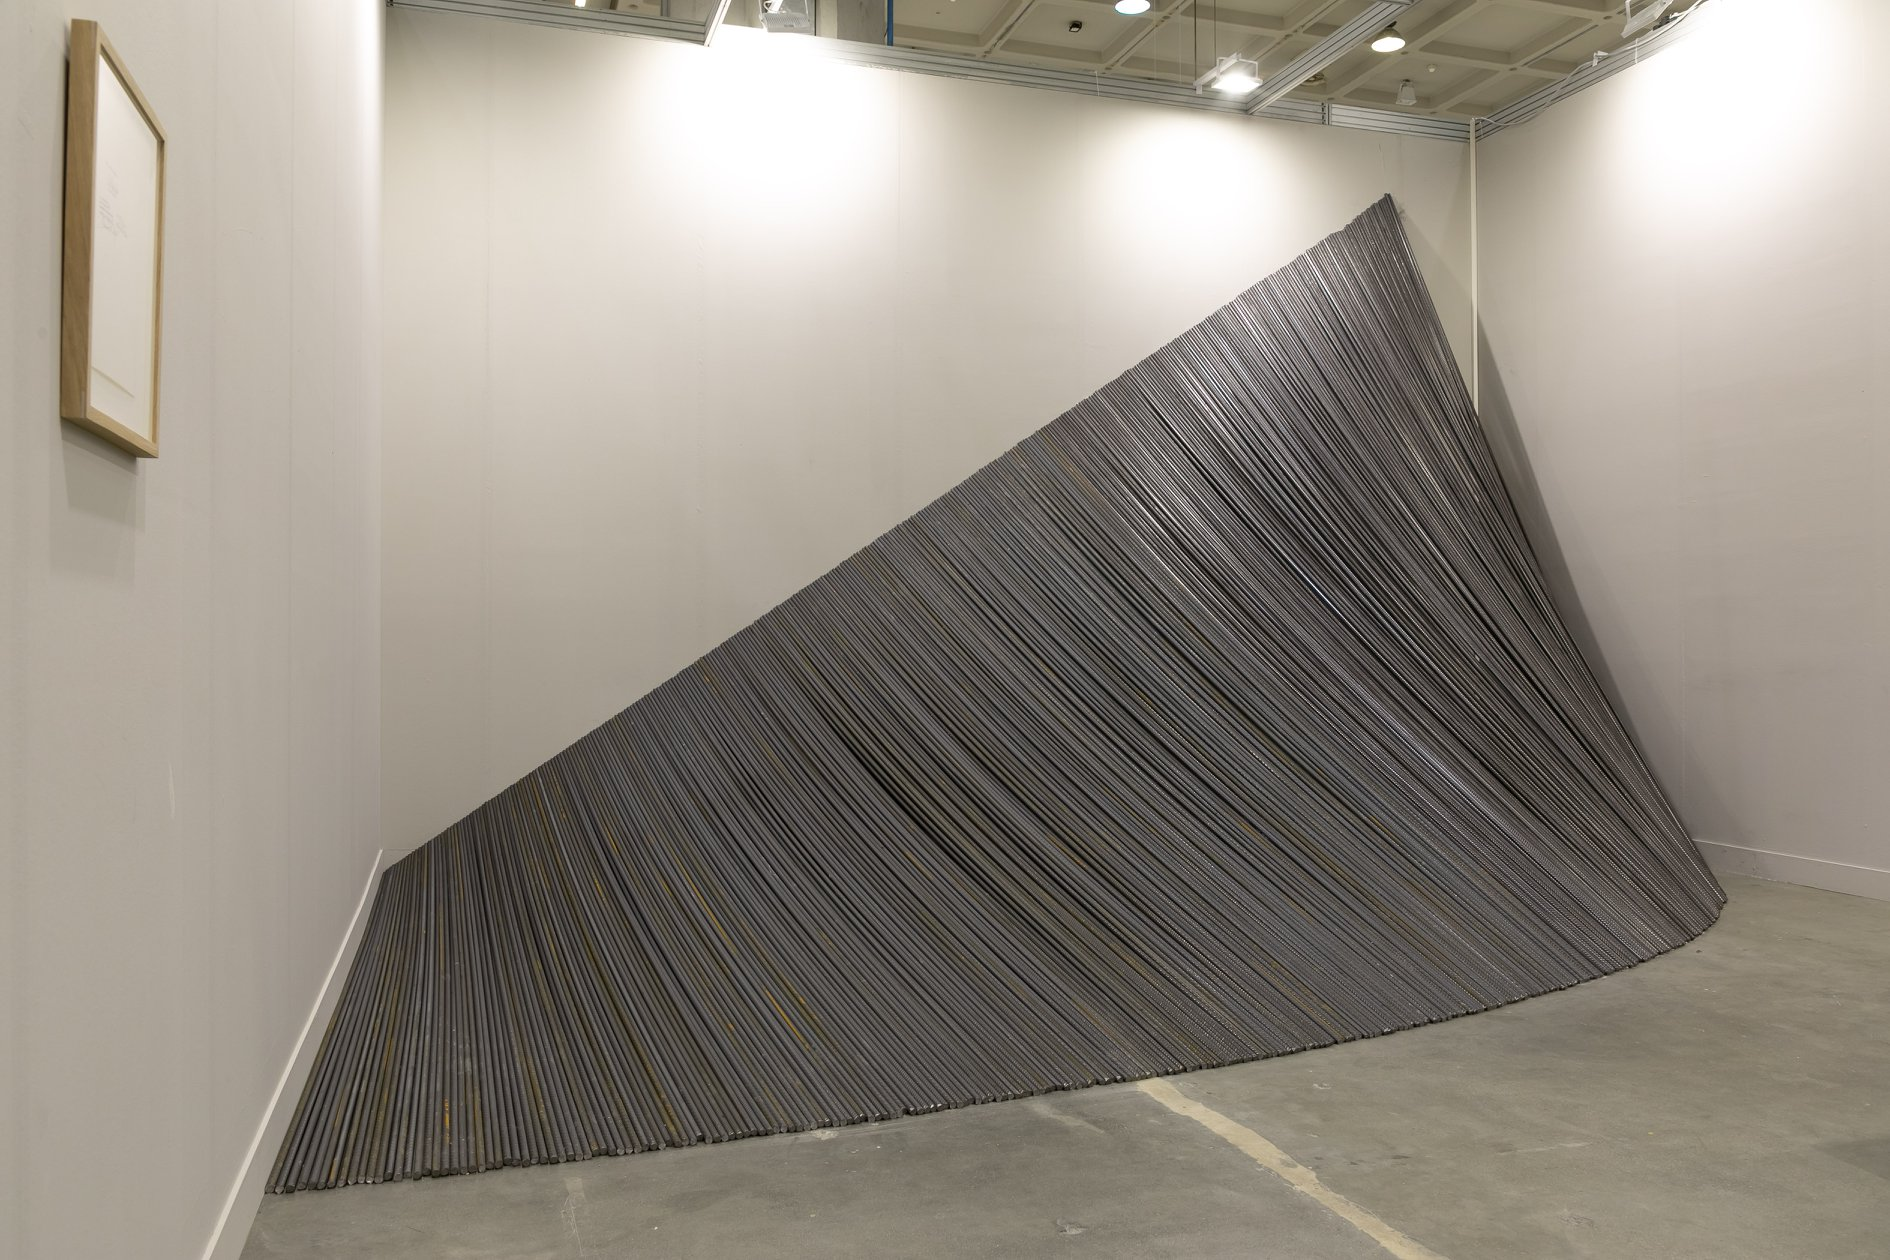 Premio Herno, Wiiliam Anastasi, Galerie Jocelyn Wolff